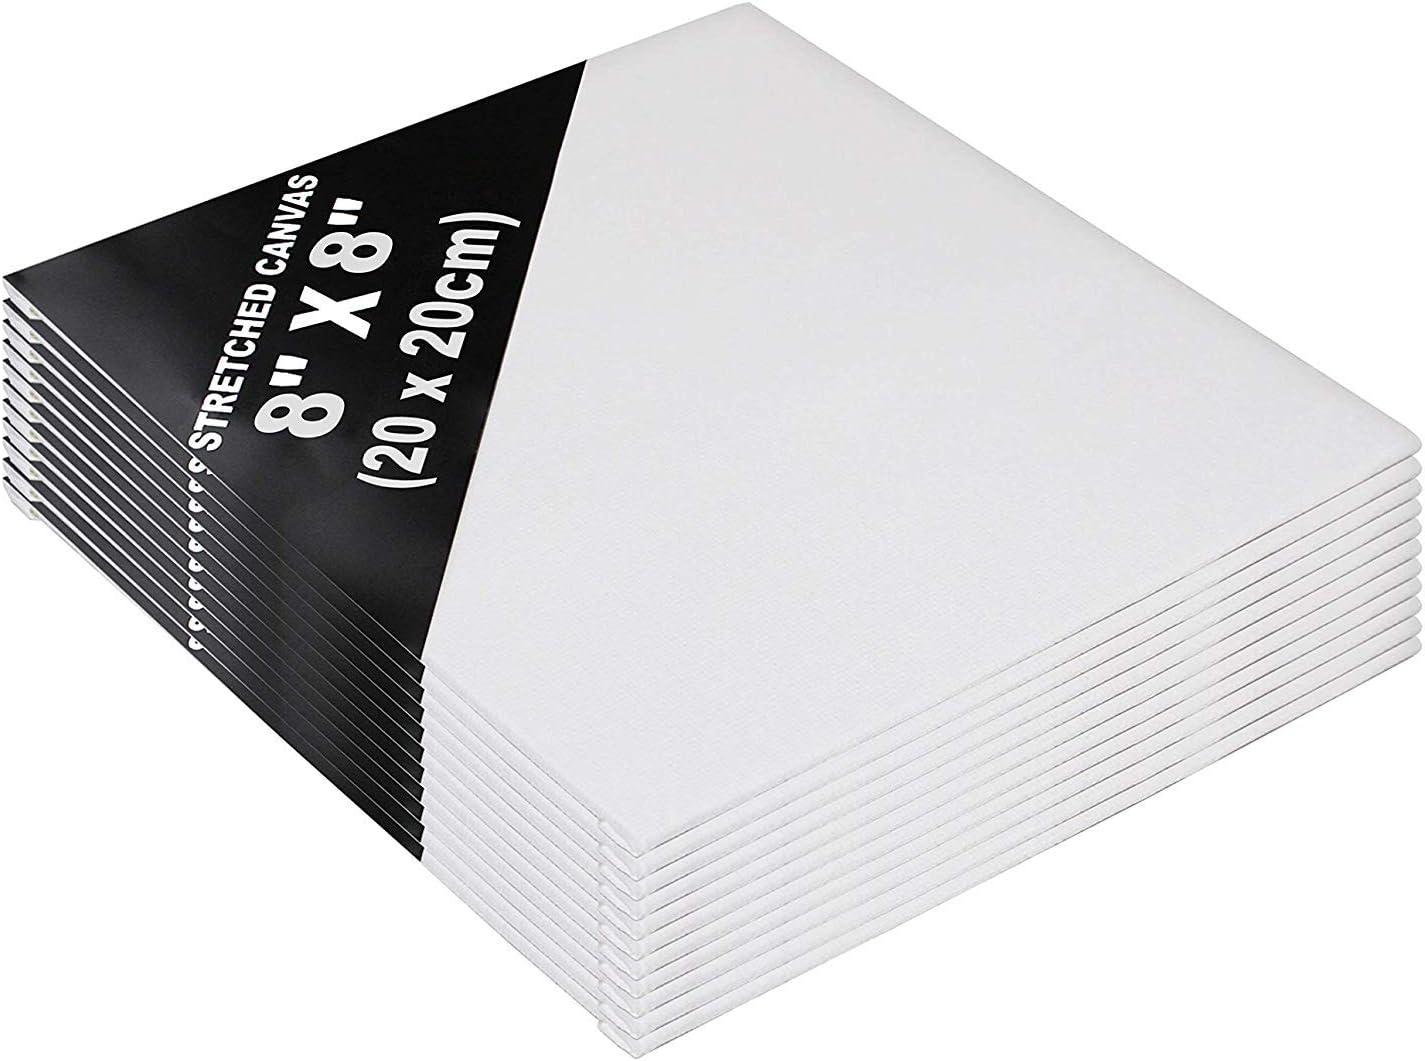 Set Lienzos 24 Piezas - Set Lienzos Blancos para Artistas - Lienzos de 20 x 20cm - Panel de Lienzo para Pintar - Lienzo en Blanco Estirado para Pintura Acrílica, Acuarela (24 Pcs): Amazon.es: Hogar